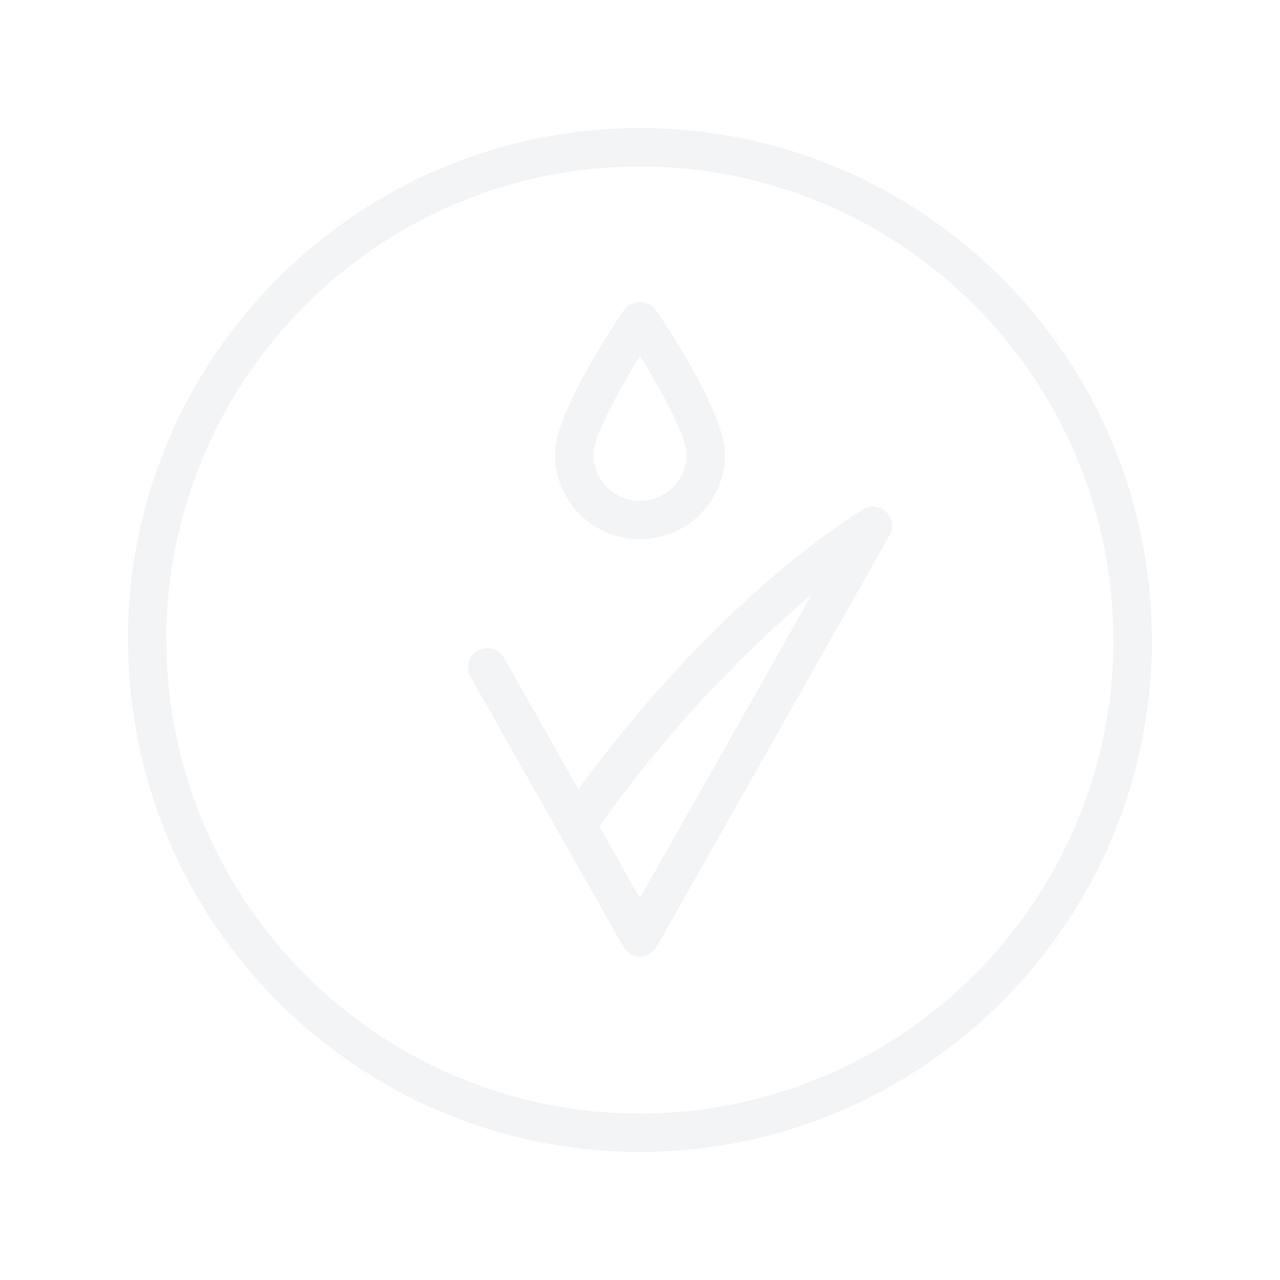 TINTS OF NATURE Henna Cream Golden Blonde 70ml